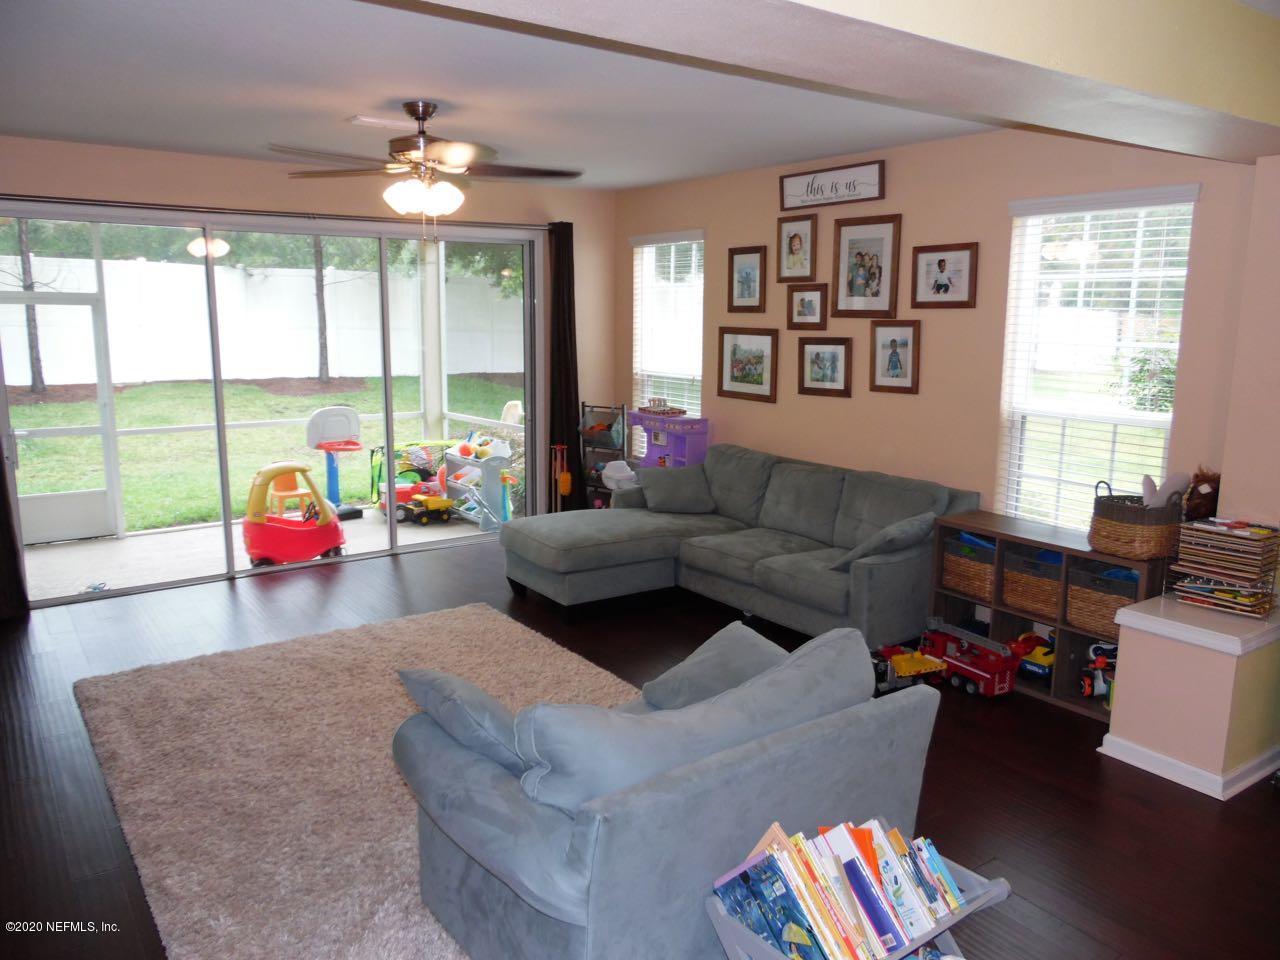 6795 ROUNDLEAF, JACKSONVILLE, FLORIDA 32258, 3 Bedrooms Bedrooms, ,2 BathroomsBathrooms,Residential,For sale,ROUNDLEAF,1055395